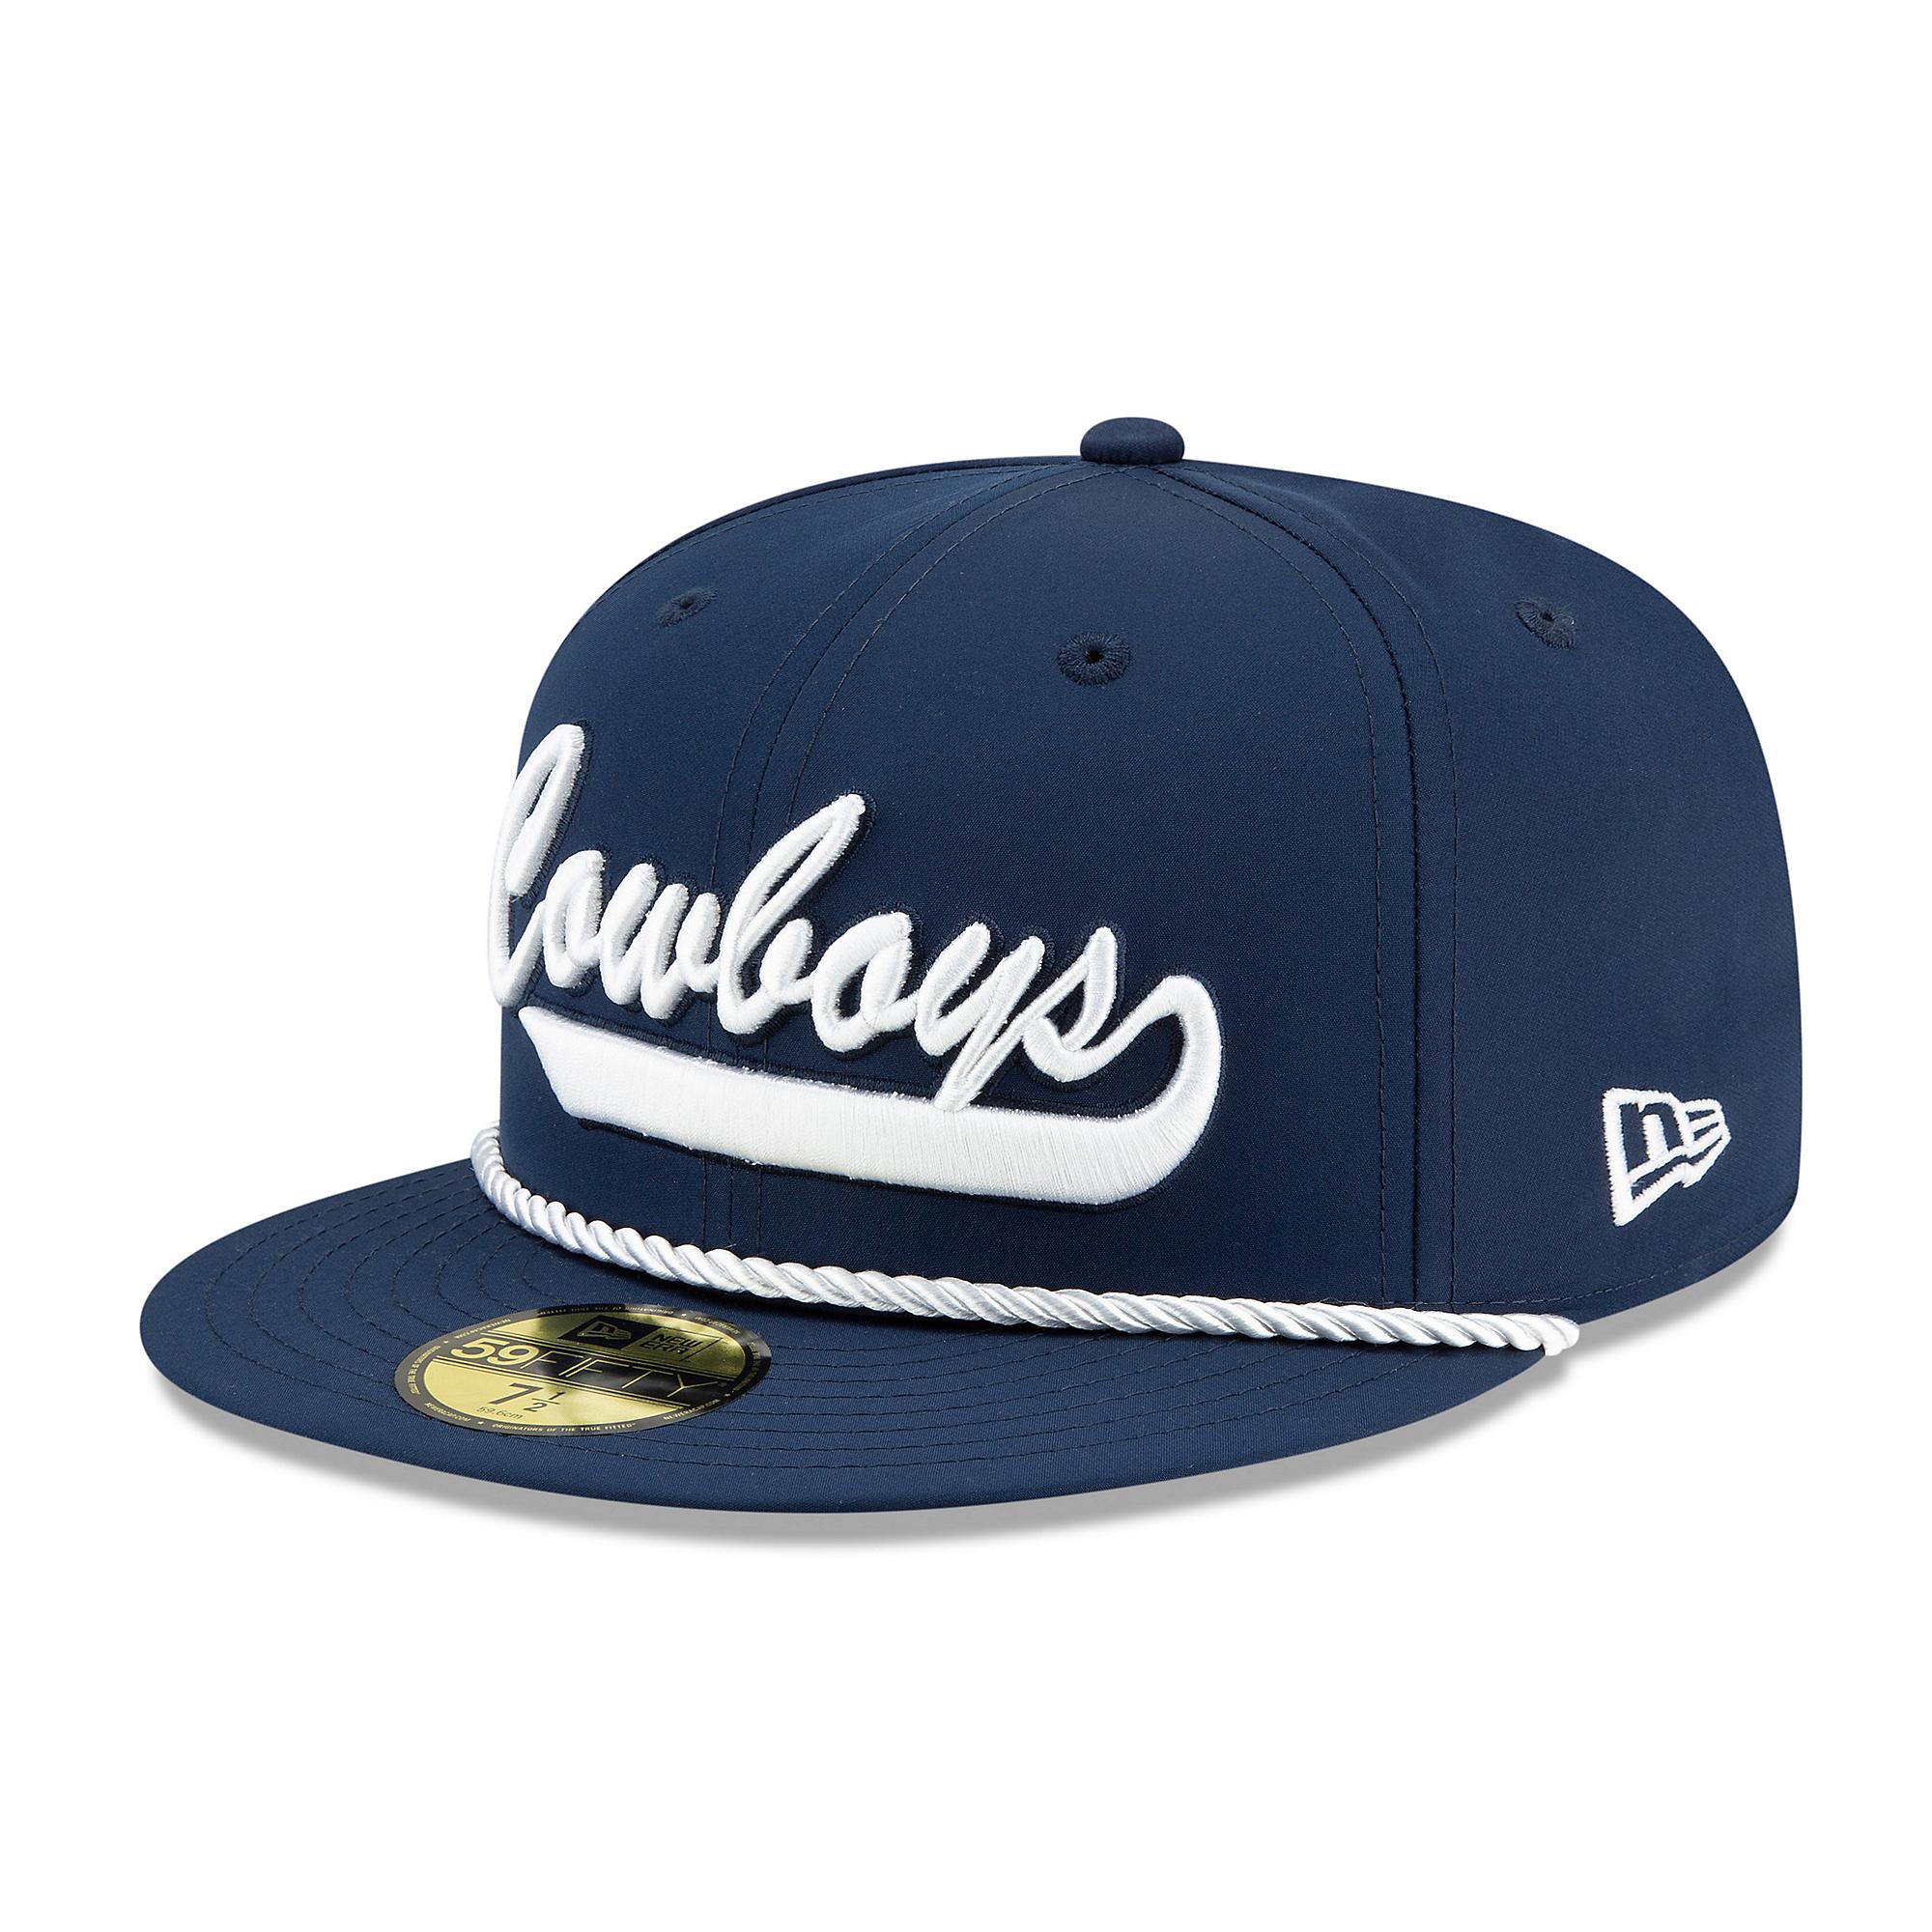 6ac025e2 Dallas Cowboys New Era Mens Navy On-Field Sideline Home 59Fifty Cap ...